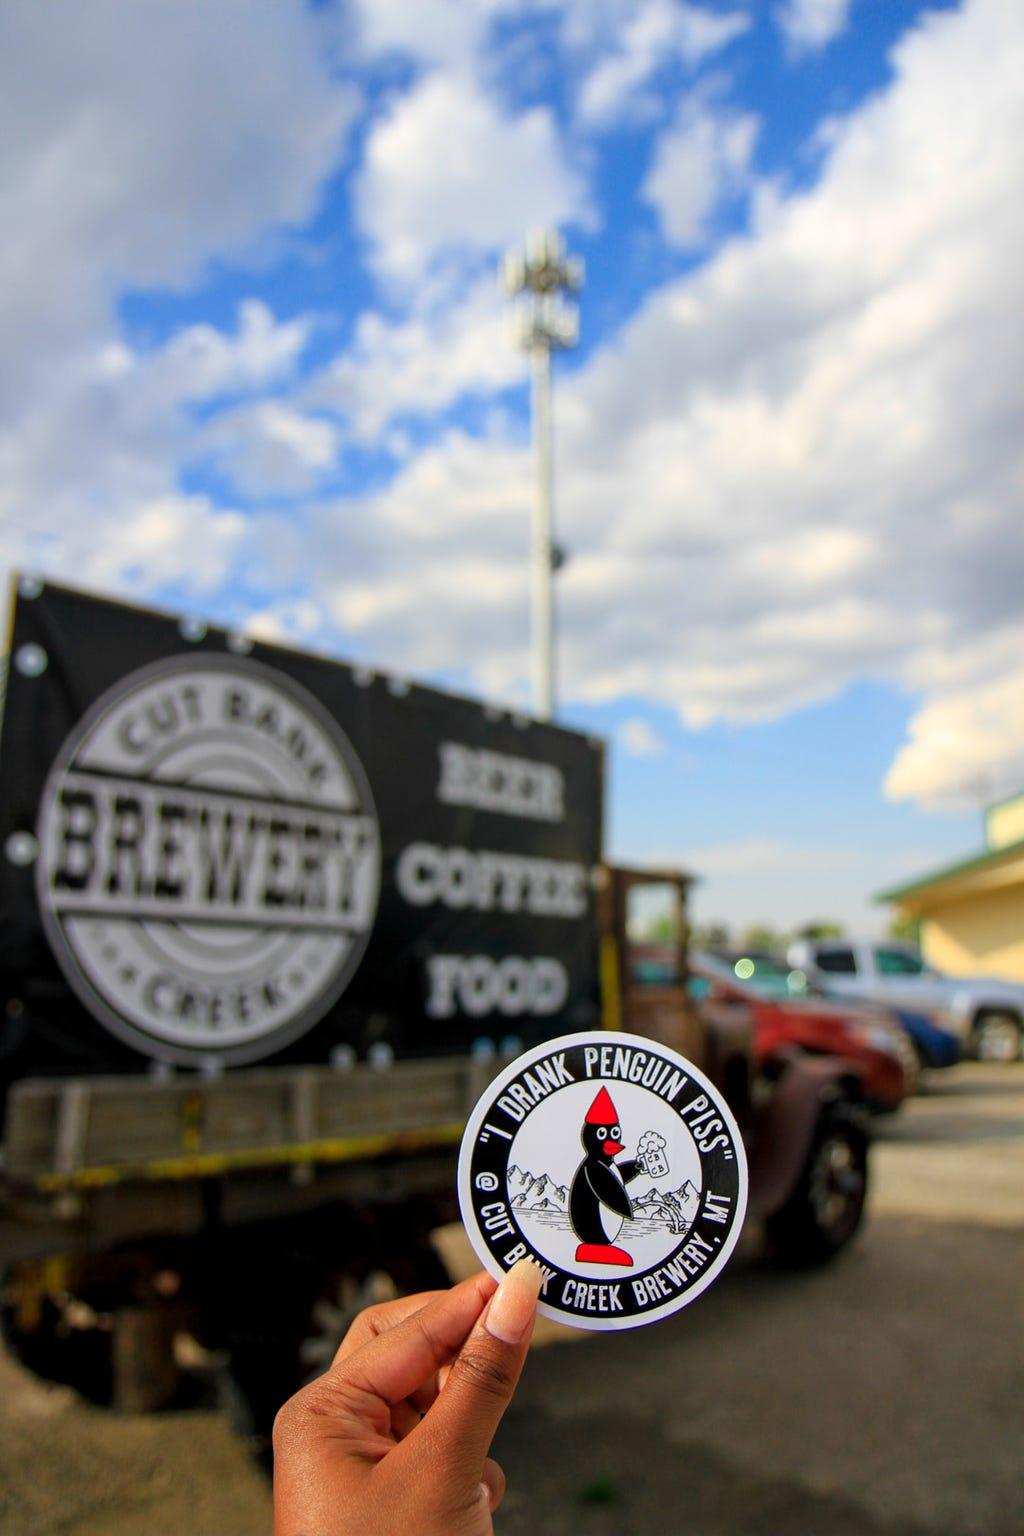 """I drank Penguin Piss @ Cut Bank Creek Brewery"" outside of Cut Bank Creek Brewery"